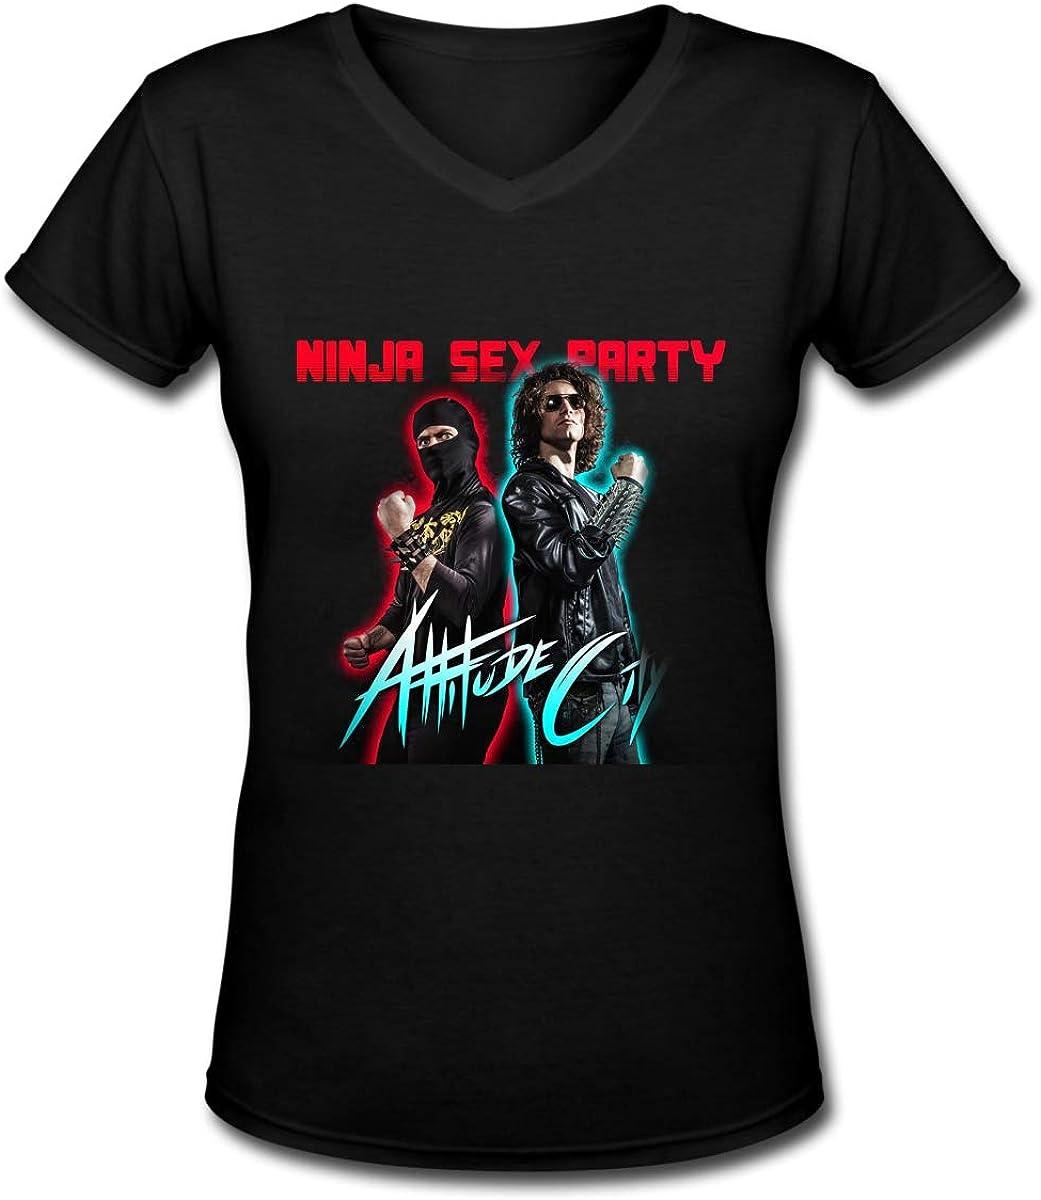 Ninja Sex Party Women Short Sleeve Basic V-Neck Cotton T Shirts Black